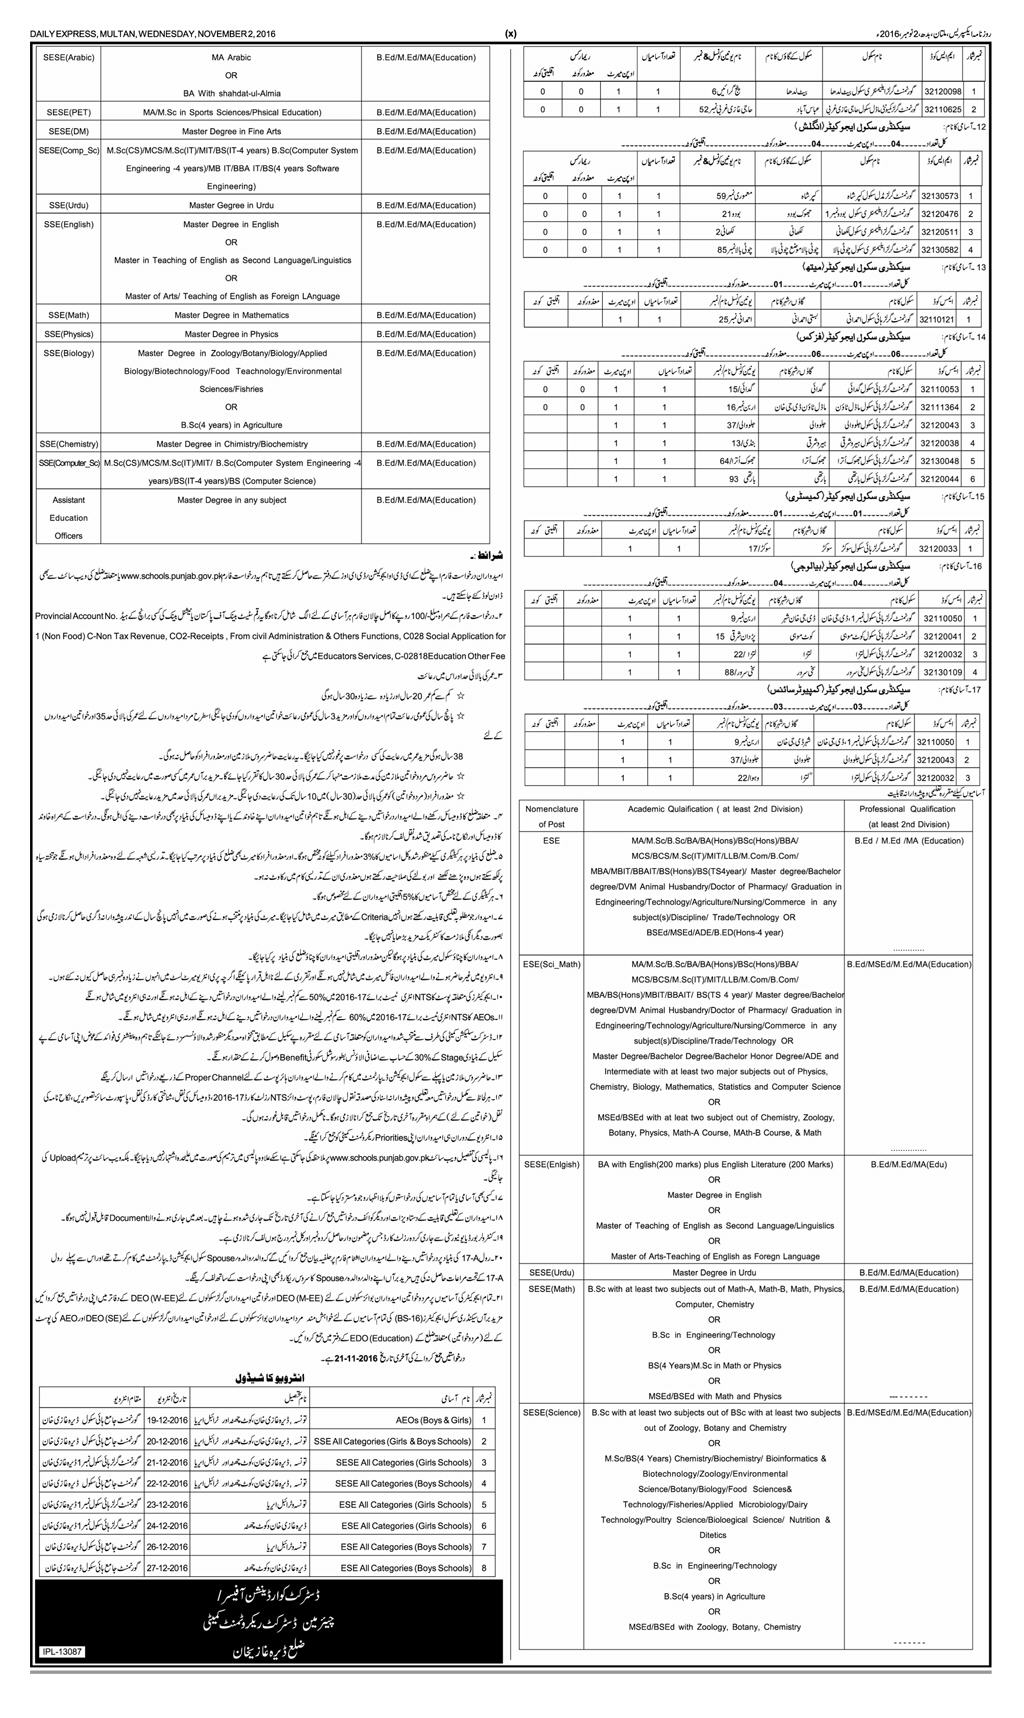 District-Dera-Ghazi-Khan-Educators-Jobs-2016-1 Job Application Form Pof on part time, blank generic, free generic,